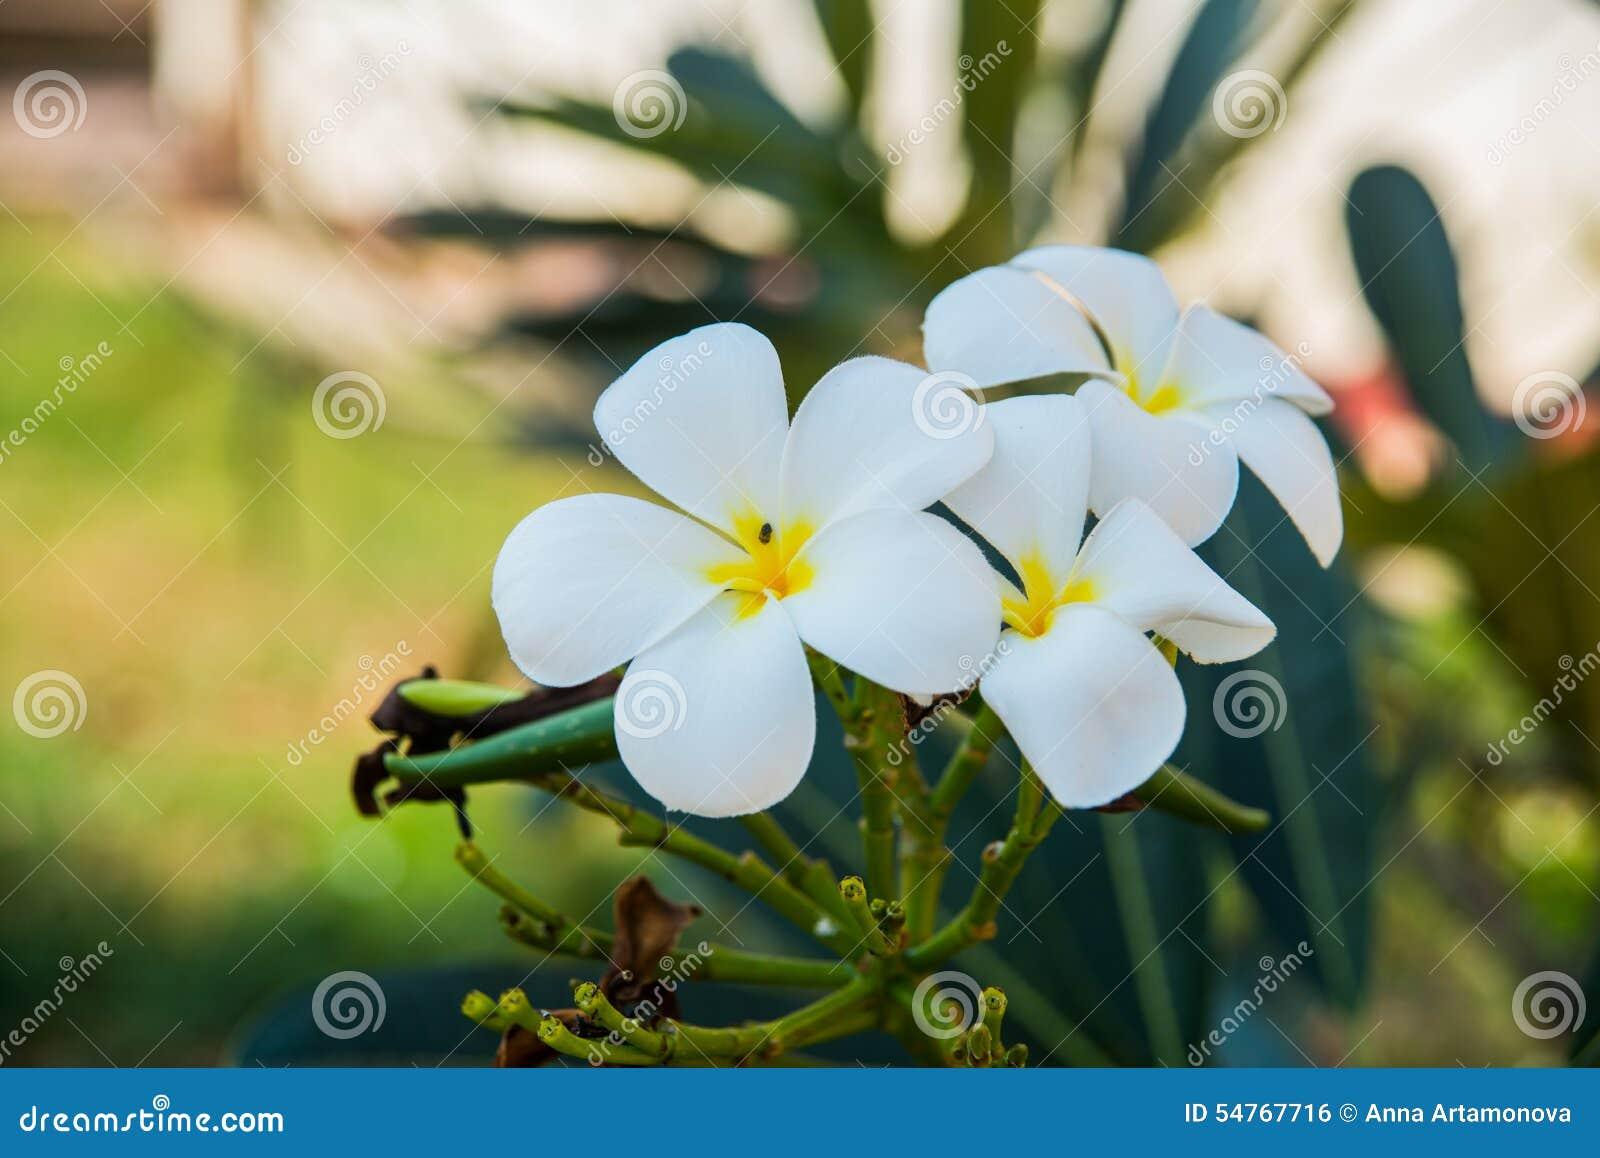 White Flowers With A Yellow Centerumeria Stock Photo Image Of